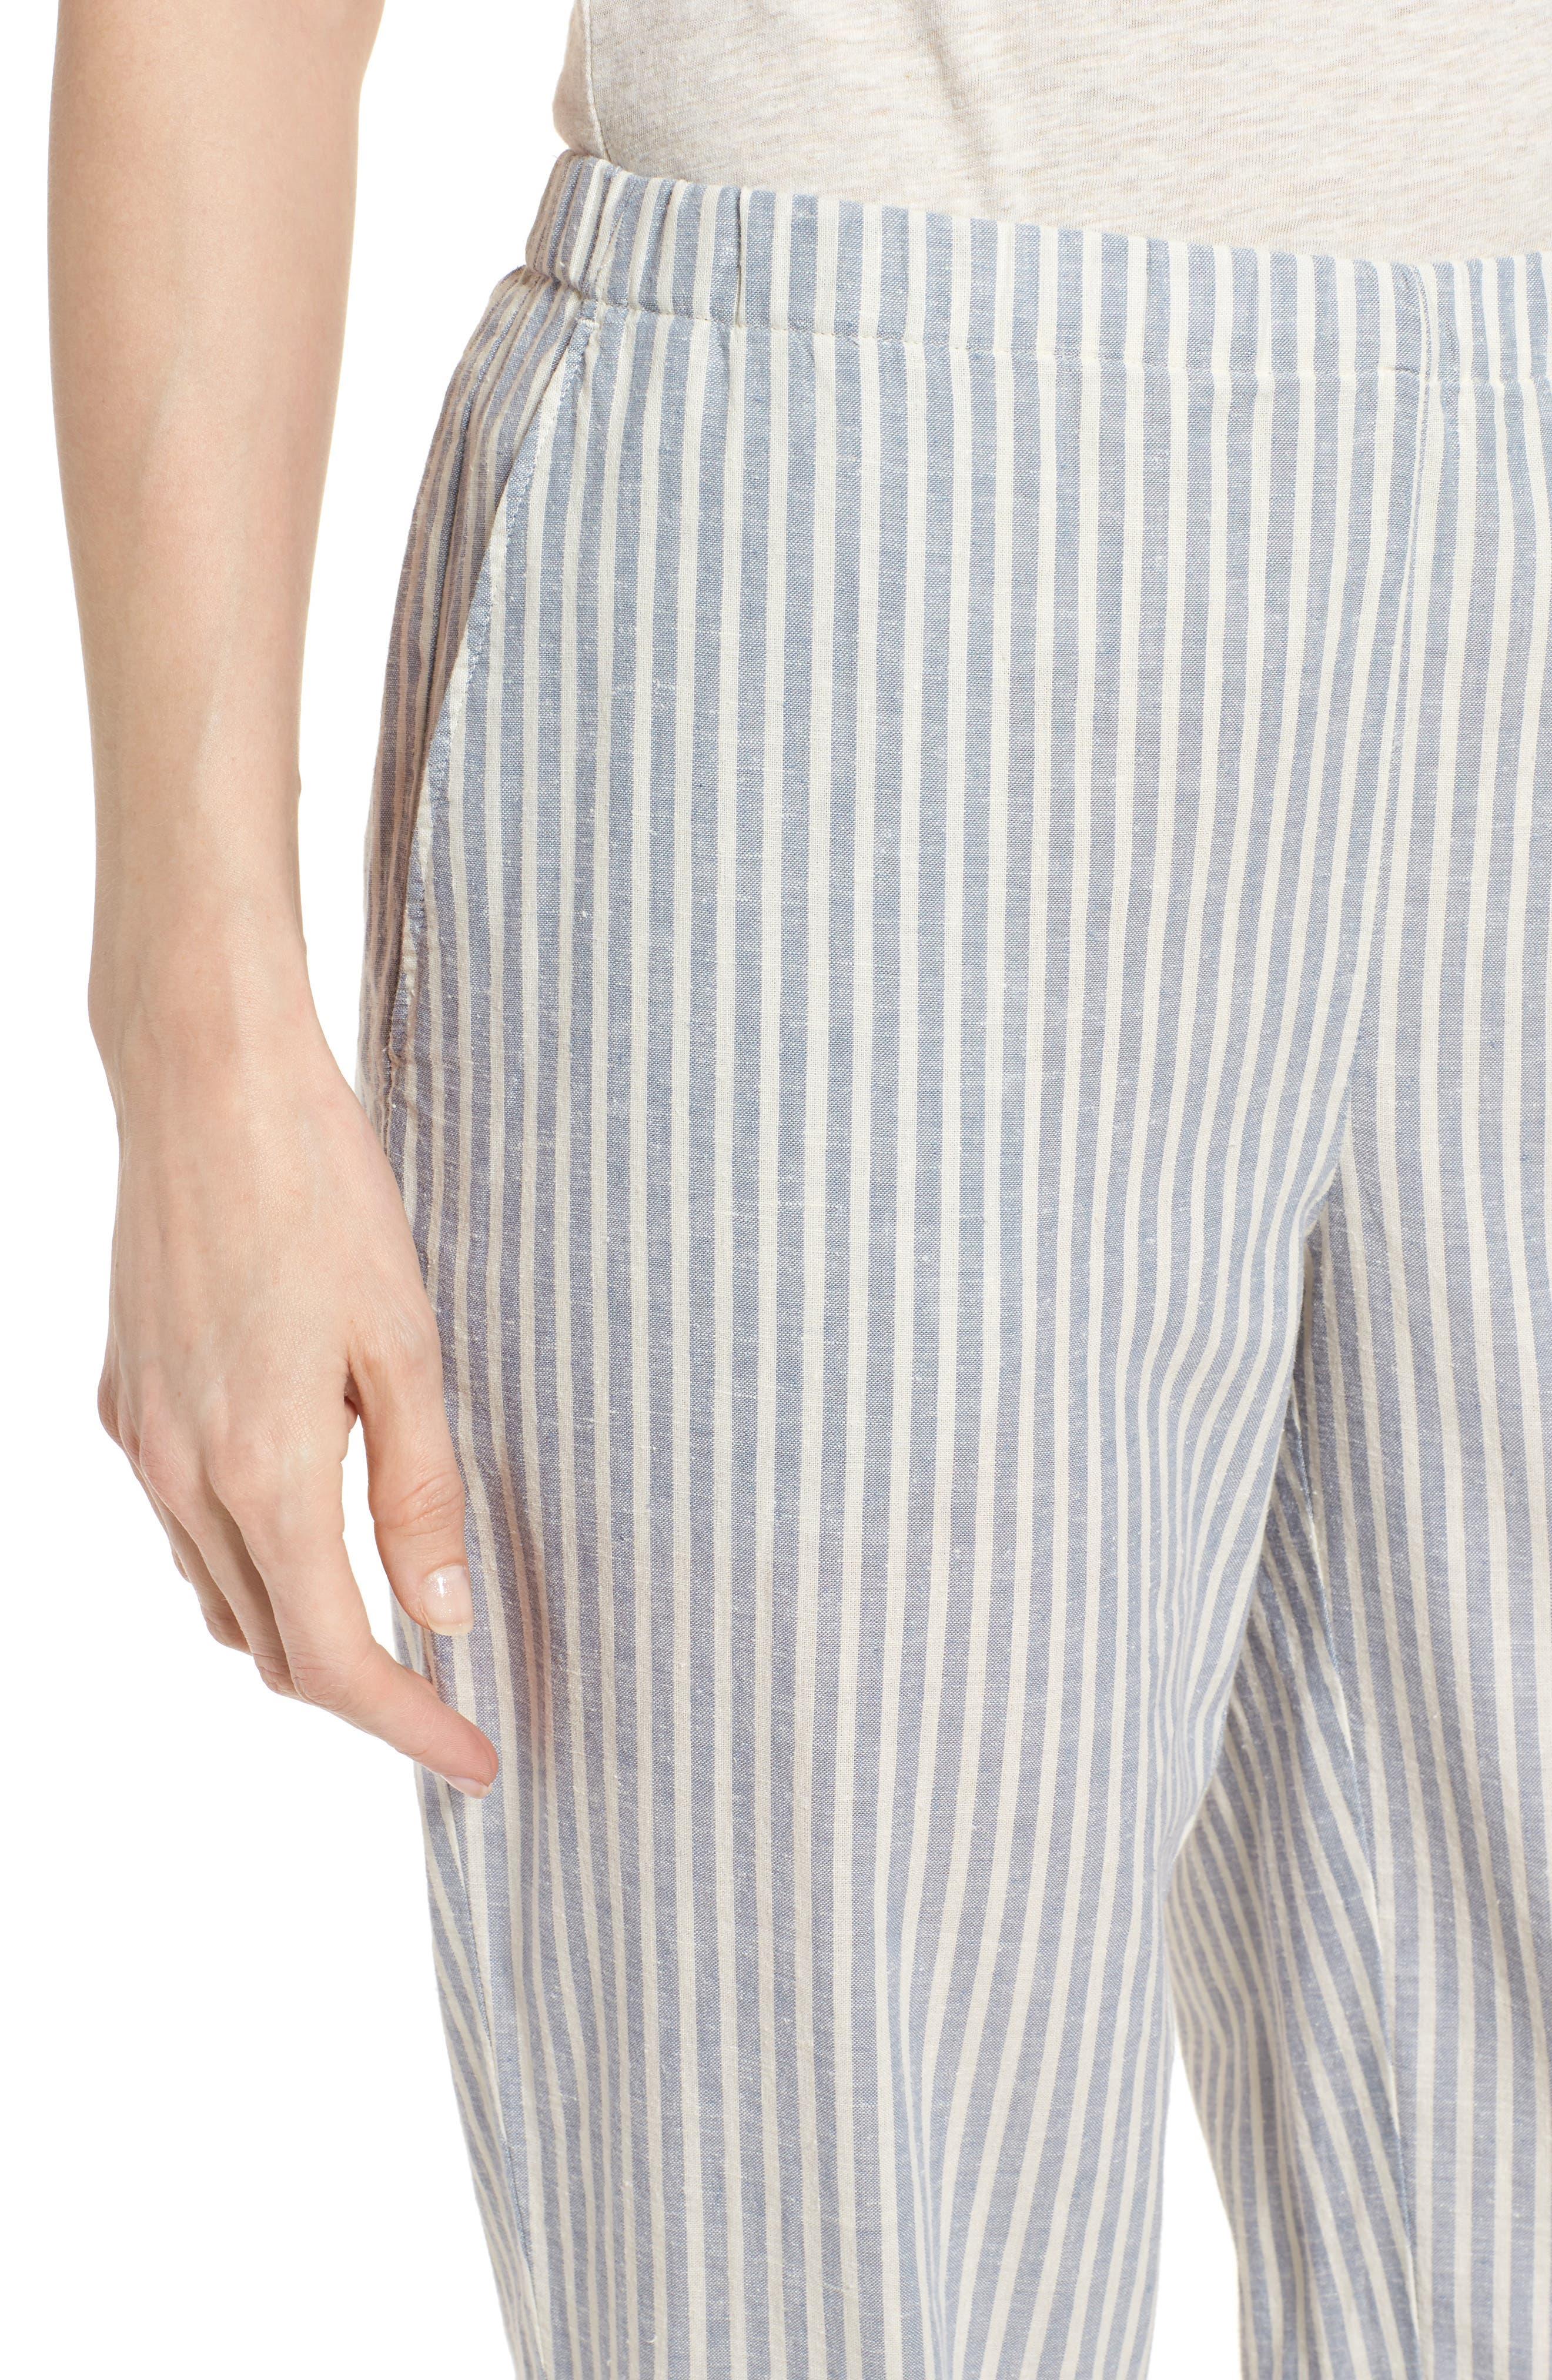 Stripe Tapered Hemp Blend Ankle Pants,                             Alternate thumbnail 4, color,                             Chambray